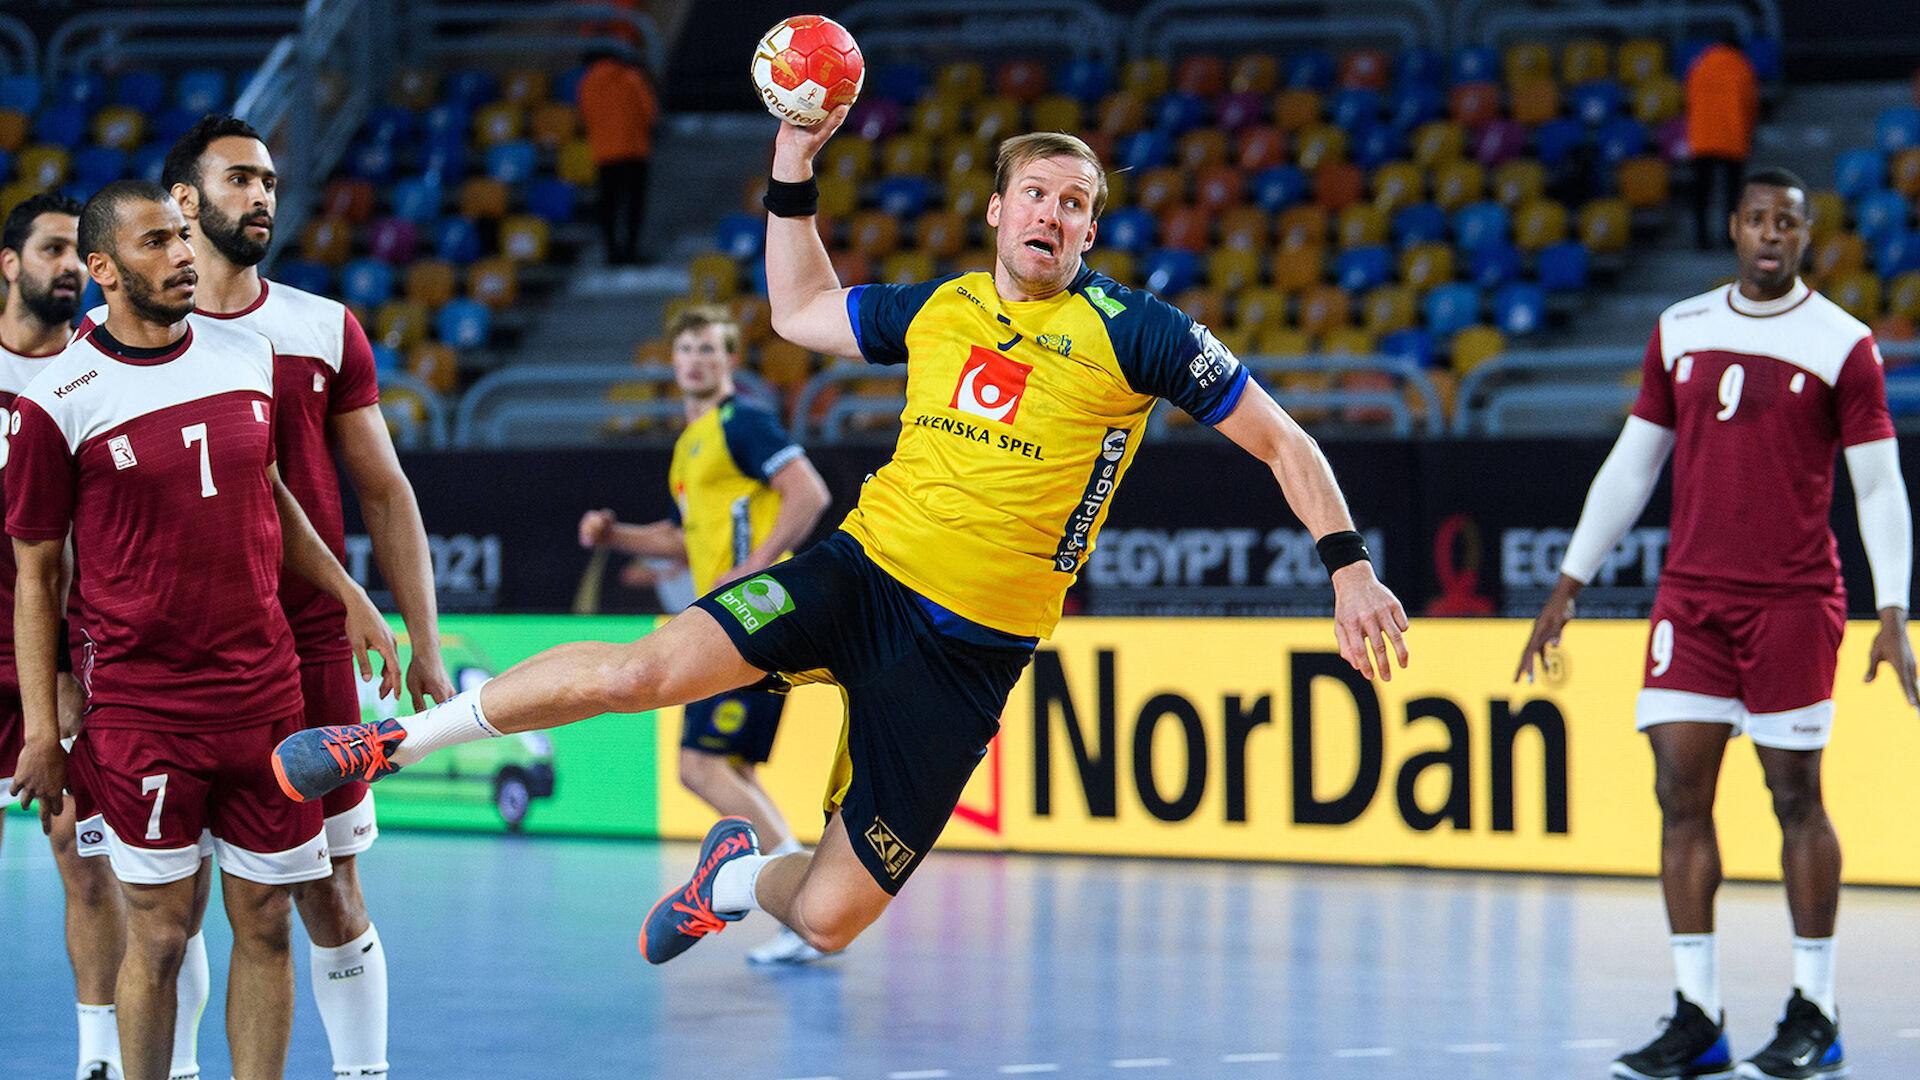 danemark gegen schweden im wm finale